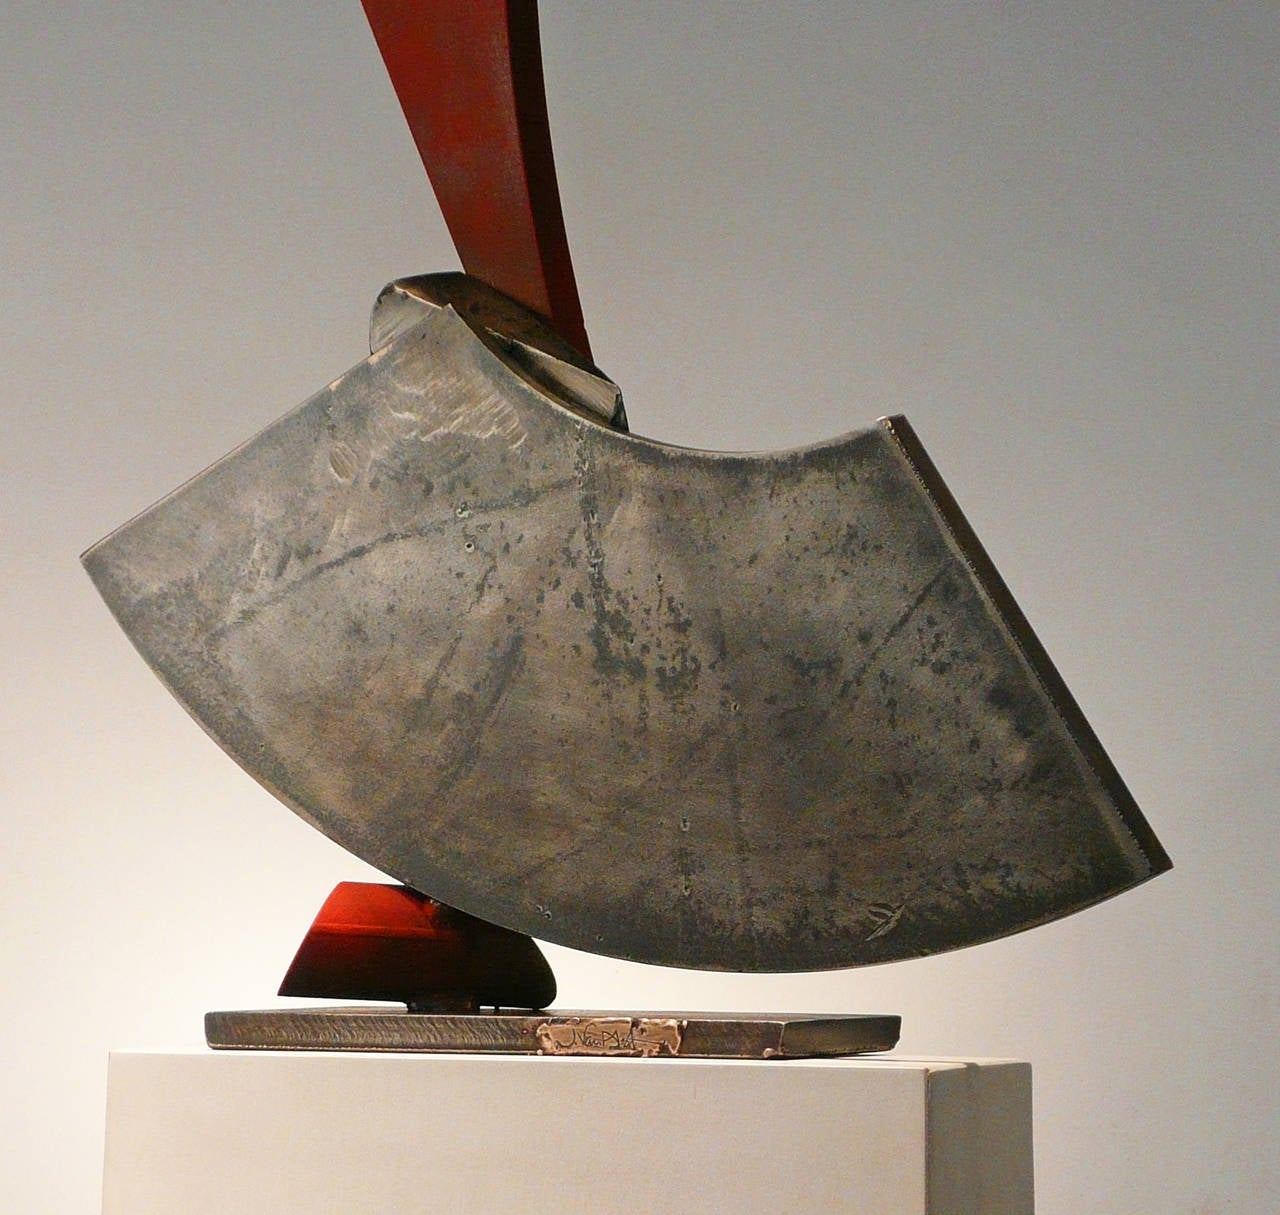 Soft Landing - Abstract Sculpture by John Van Alstine